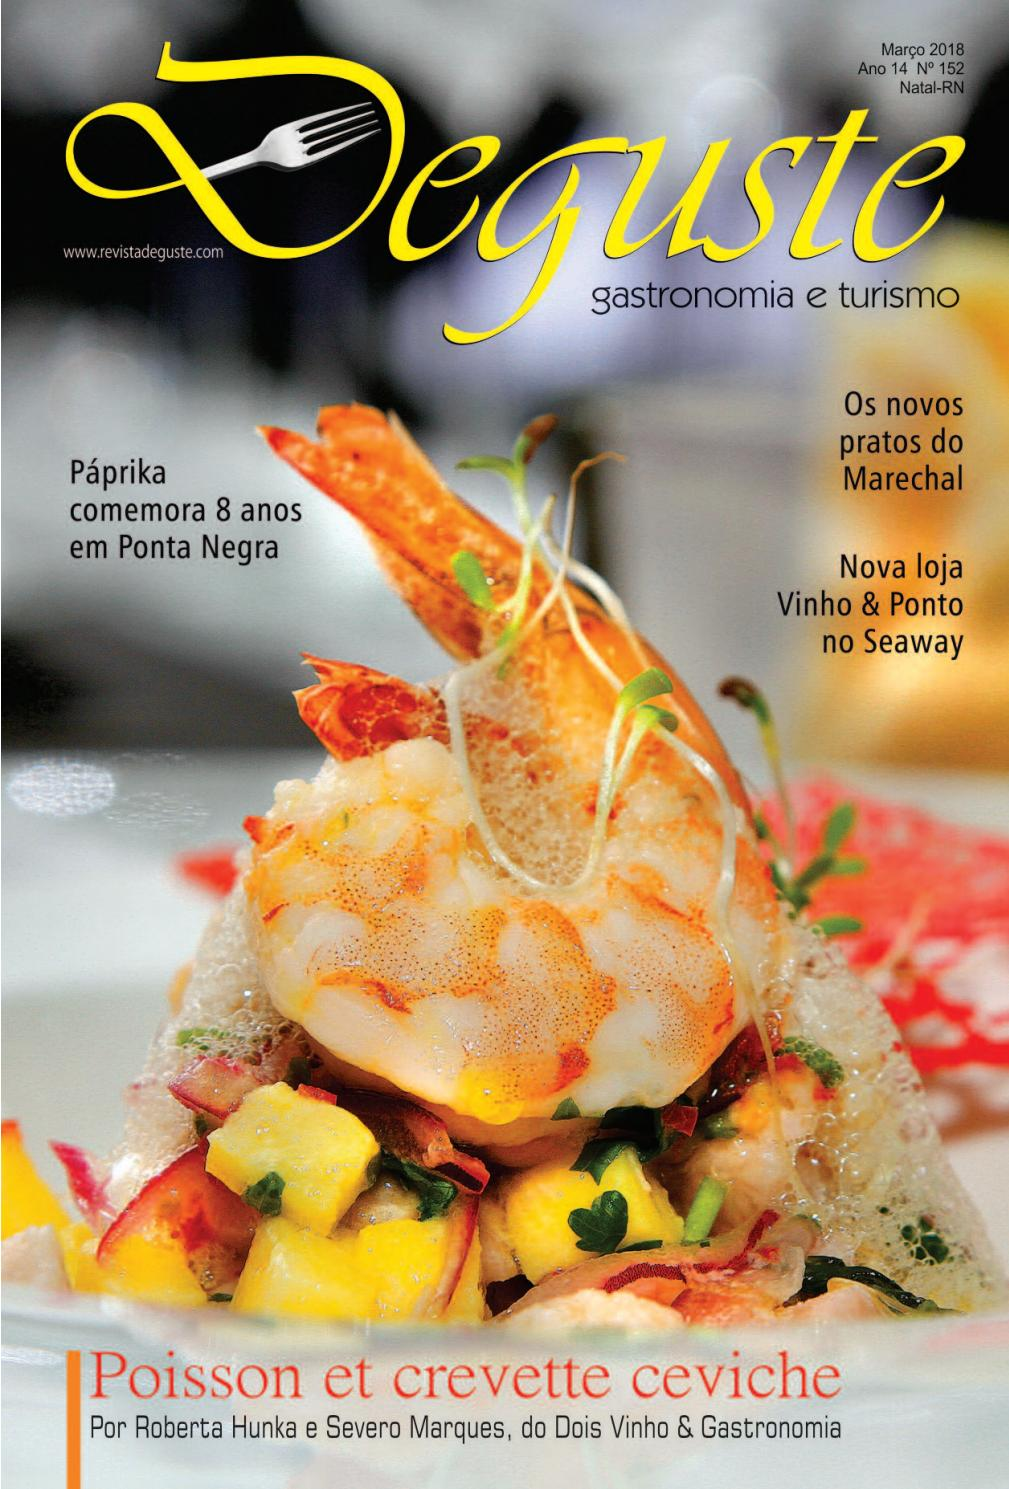 623441c2d46a4 Revista Deguste - Março 2018 by Revista Deguste - issuu